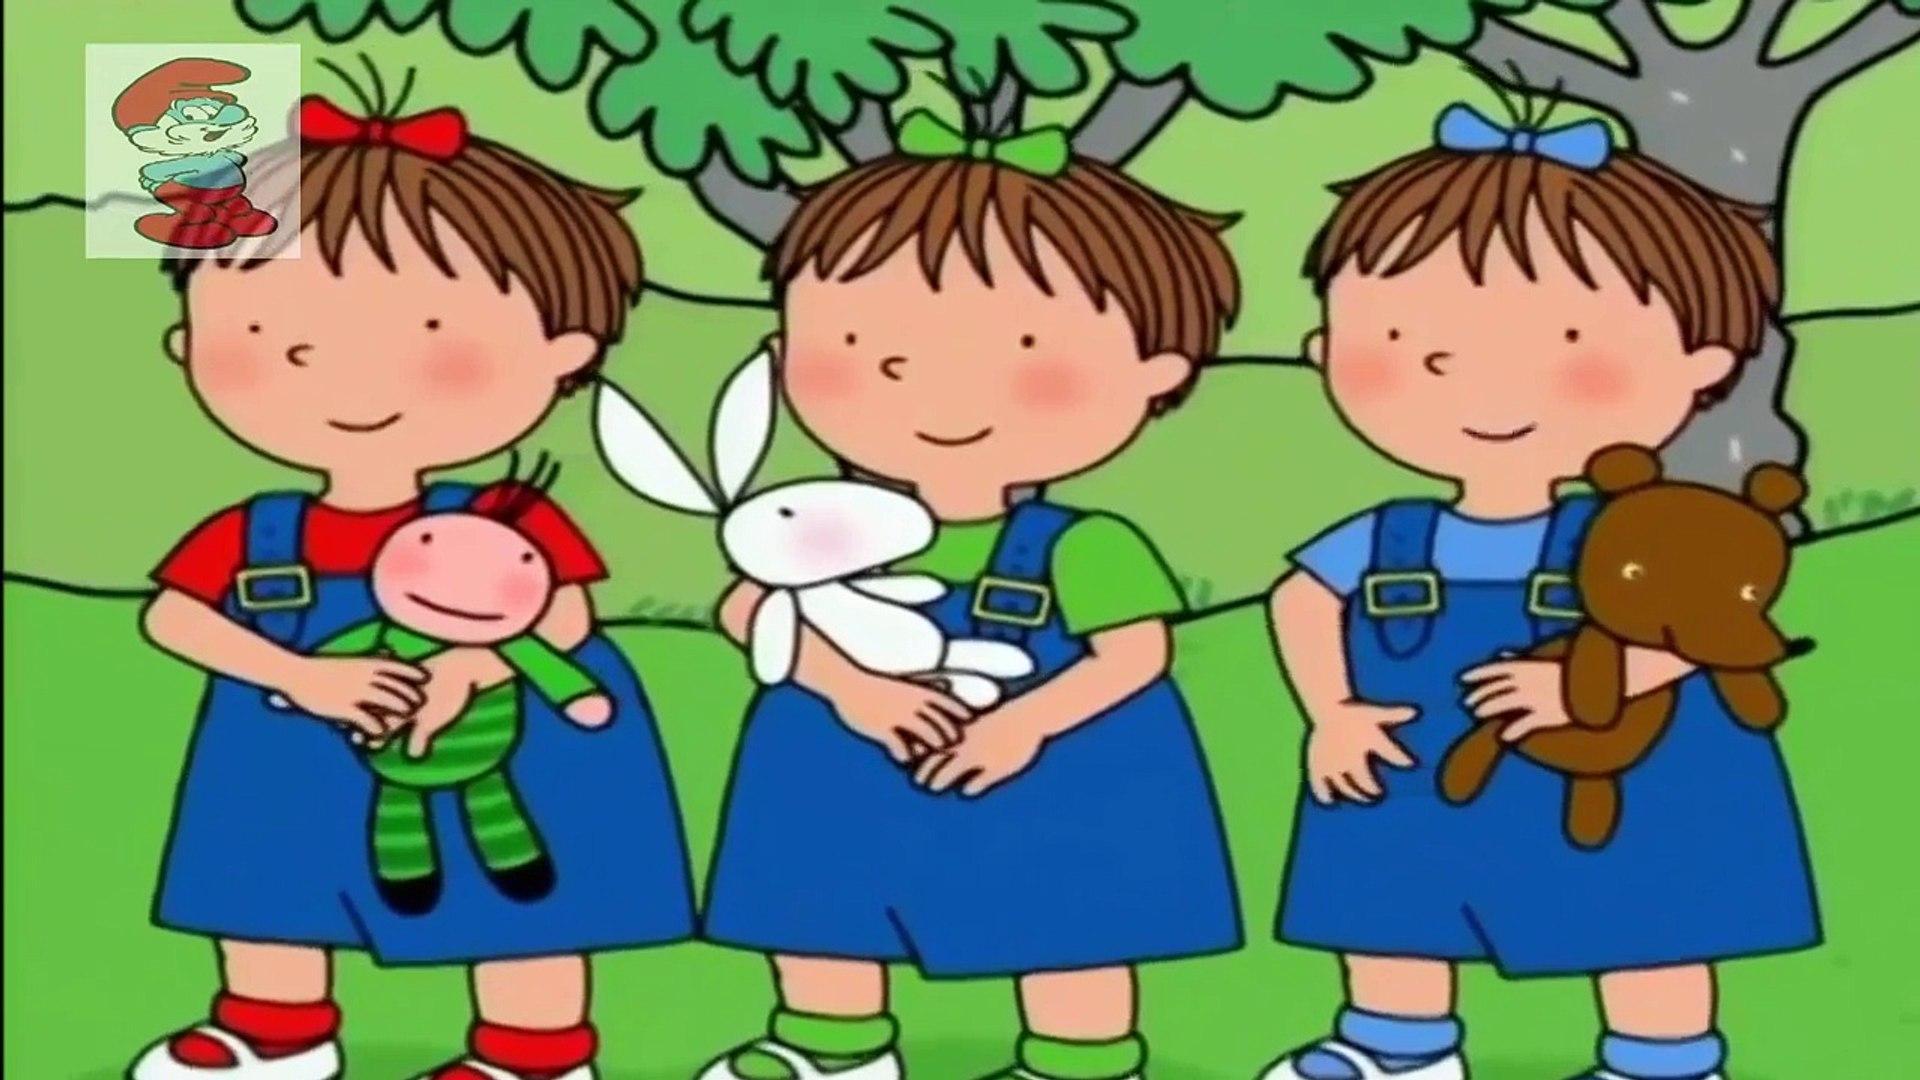 Turkish, Turkish cartoon watch cartoons watch Hello triplets ...